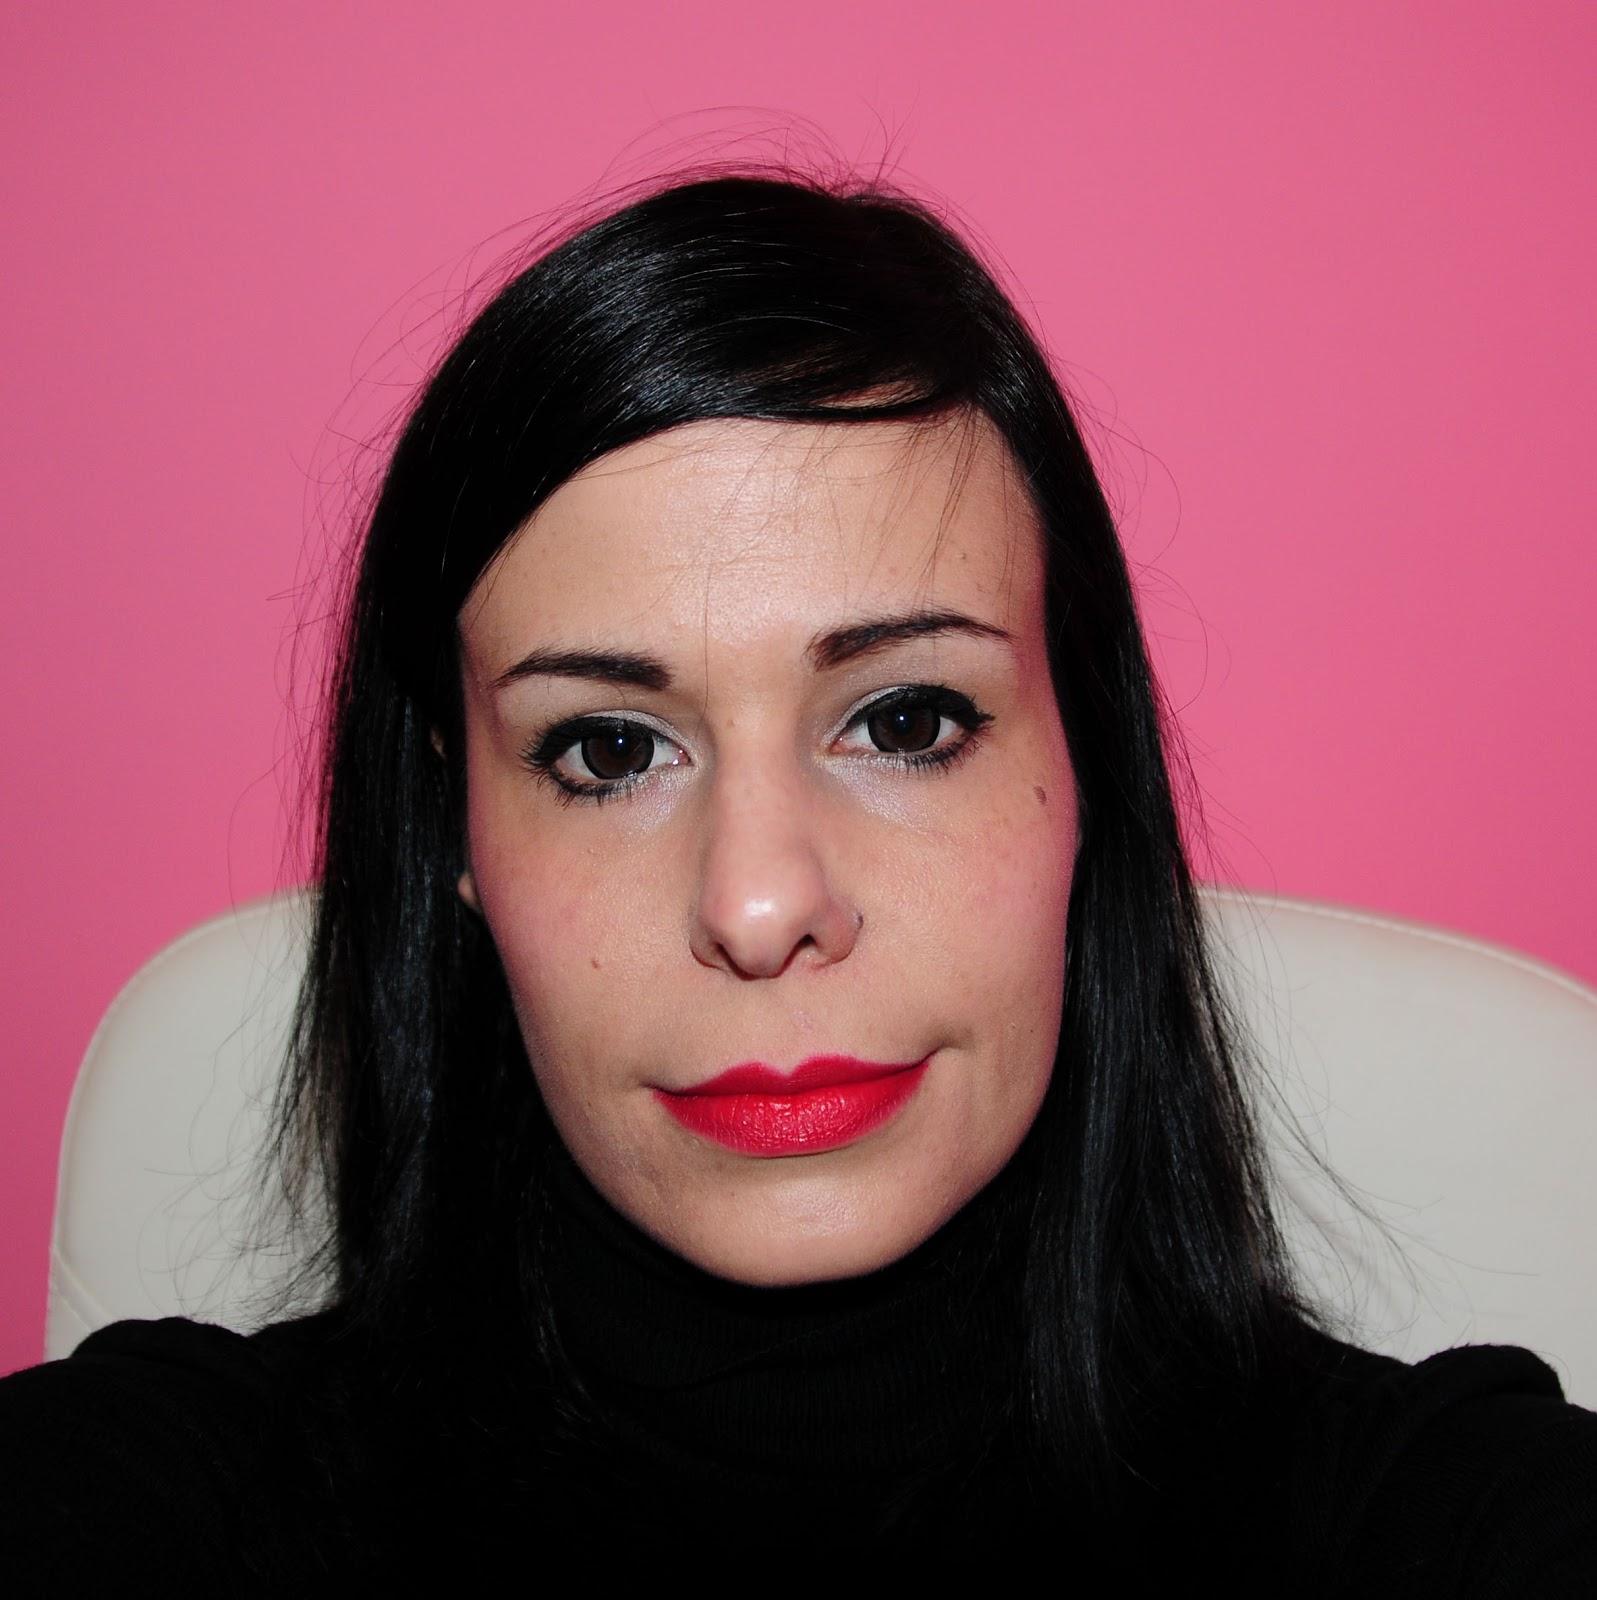 love4beauty c mo maquillar nuestros labios. Black Bedroom Furniture Sets. Home Design Ideas